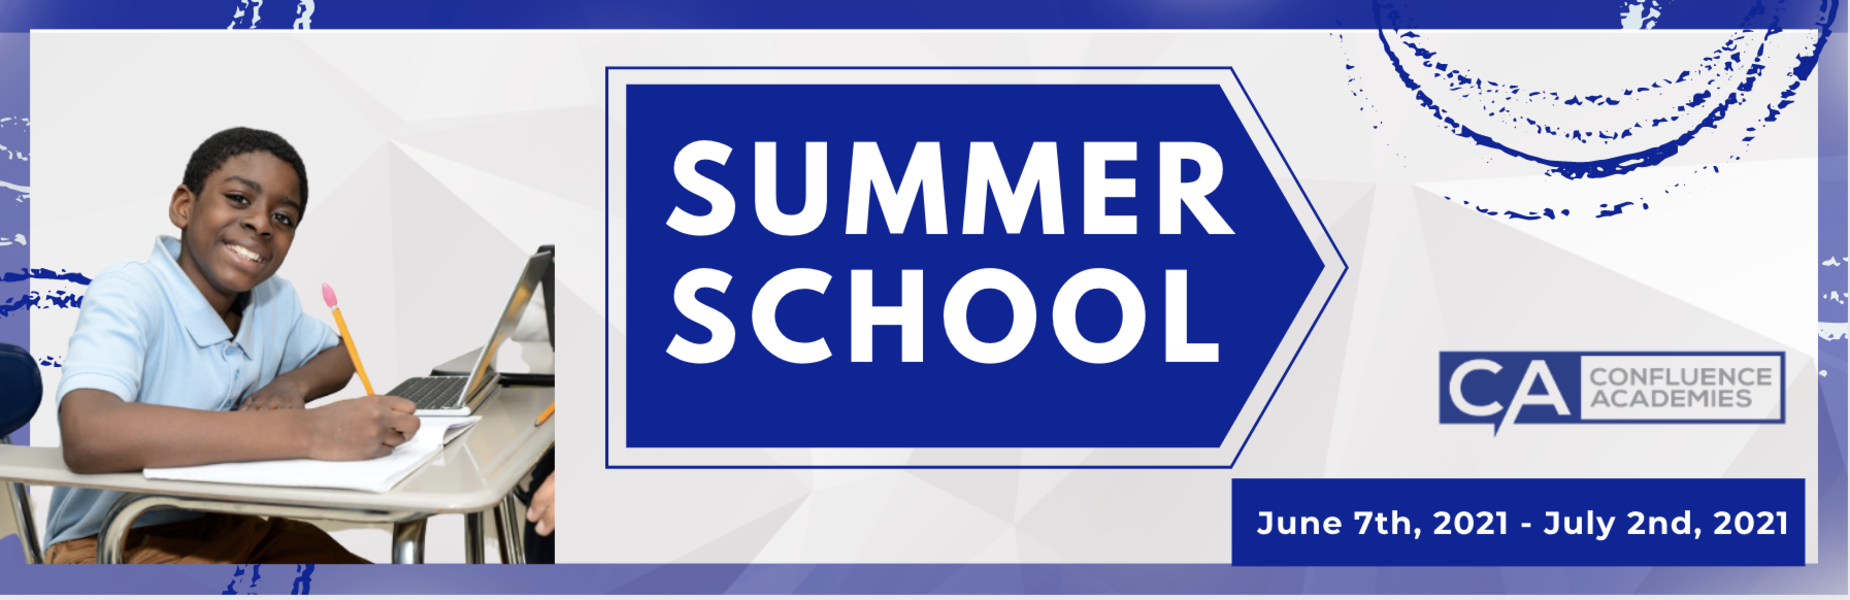 summer school confluence academies